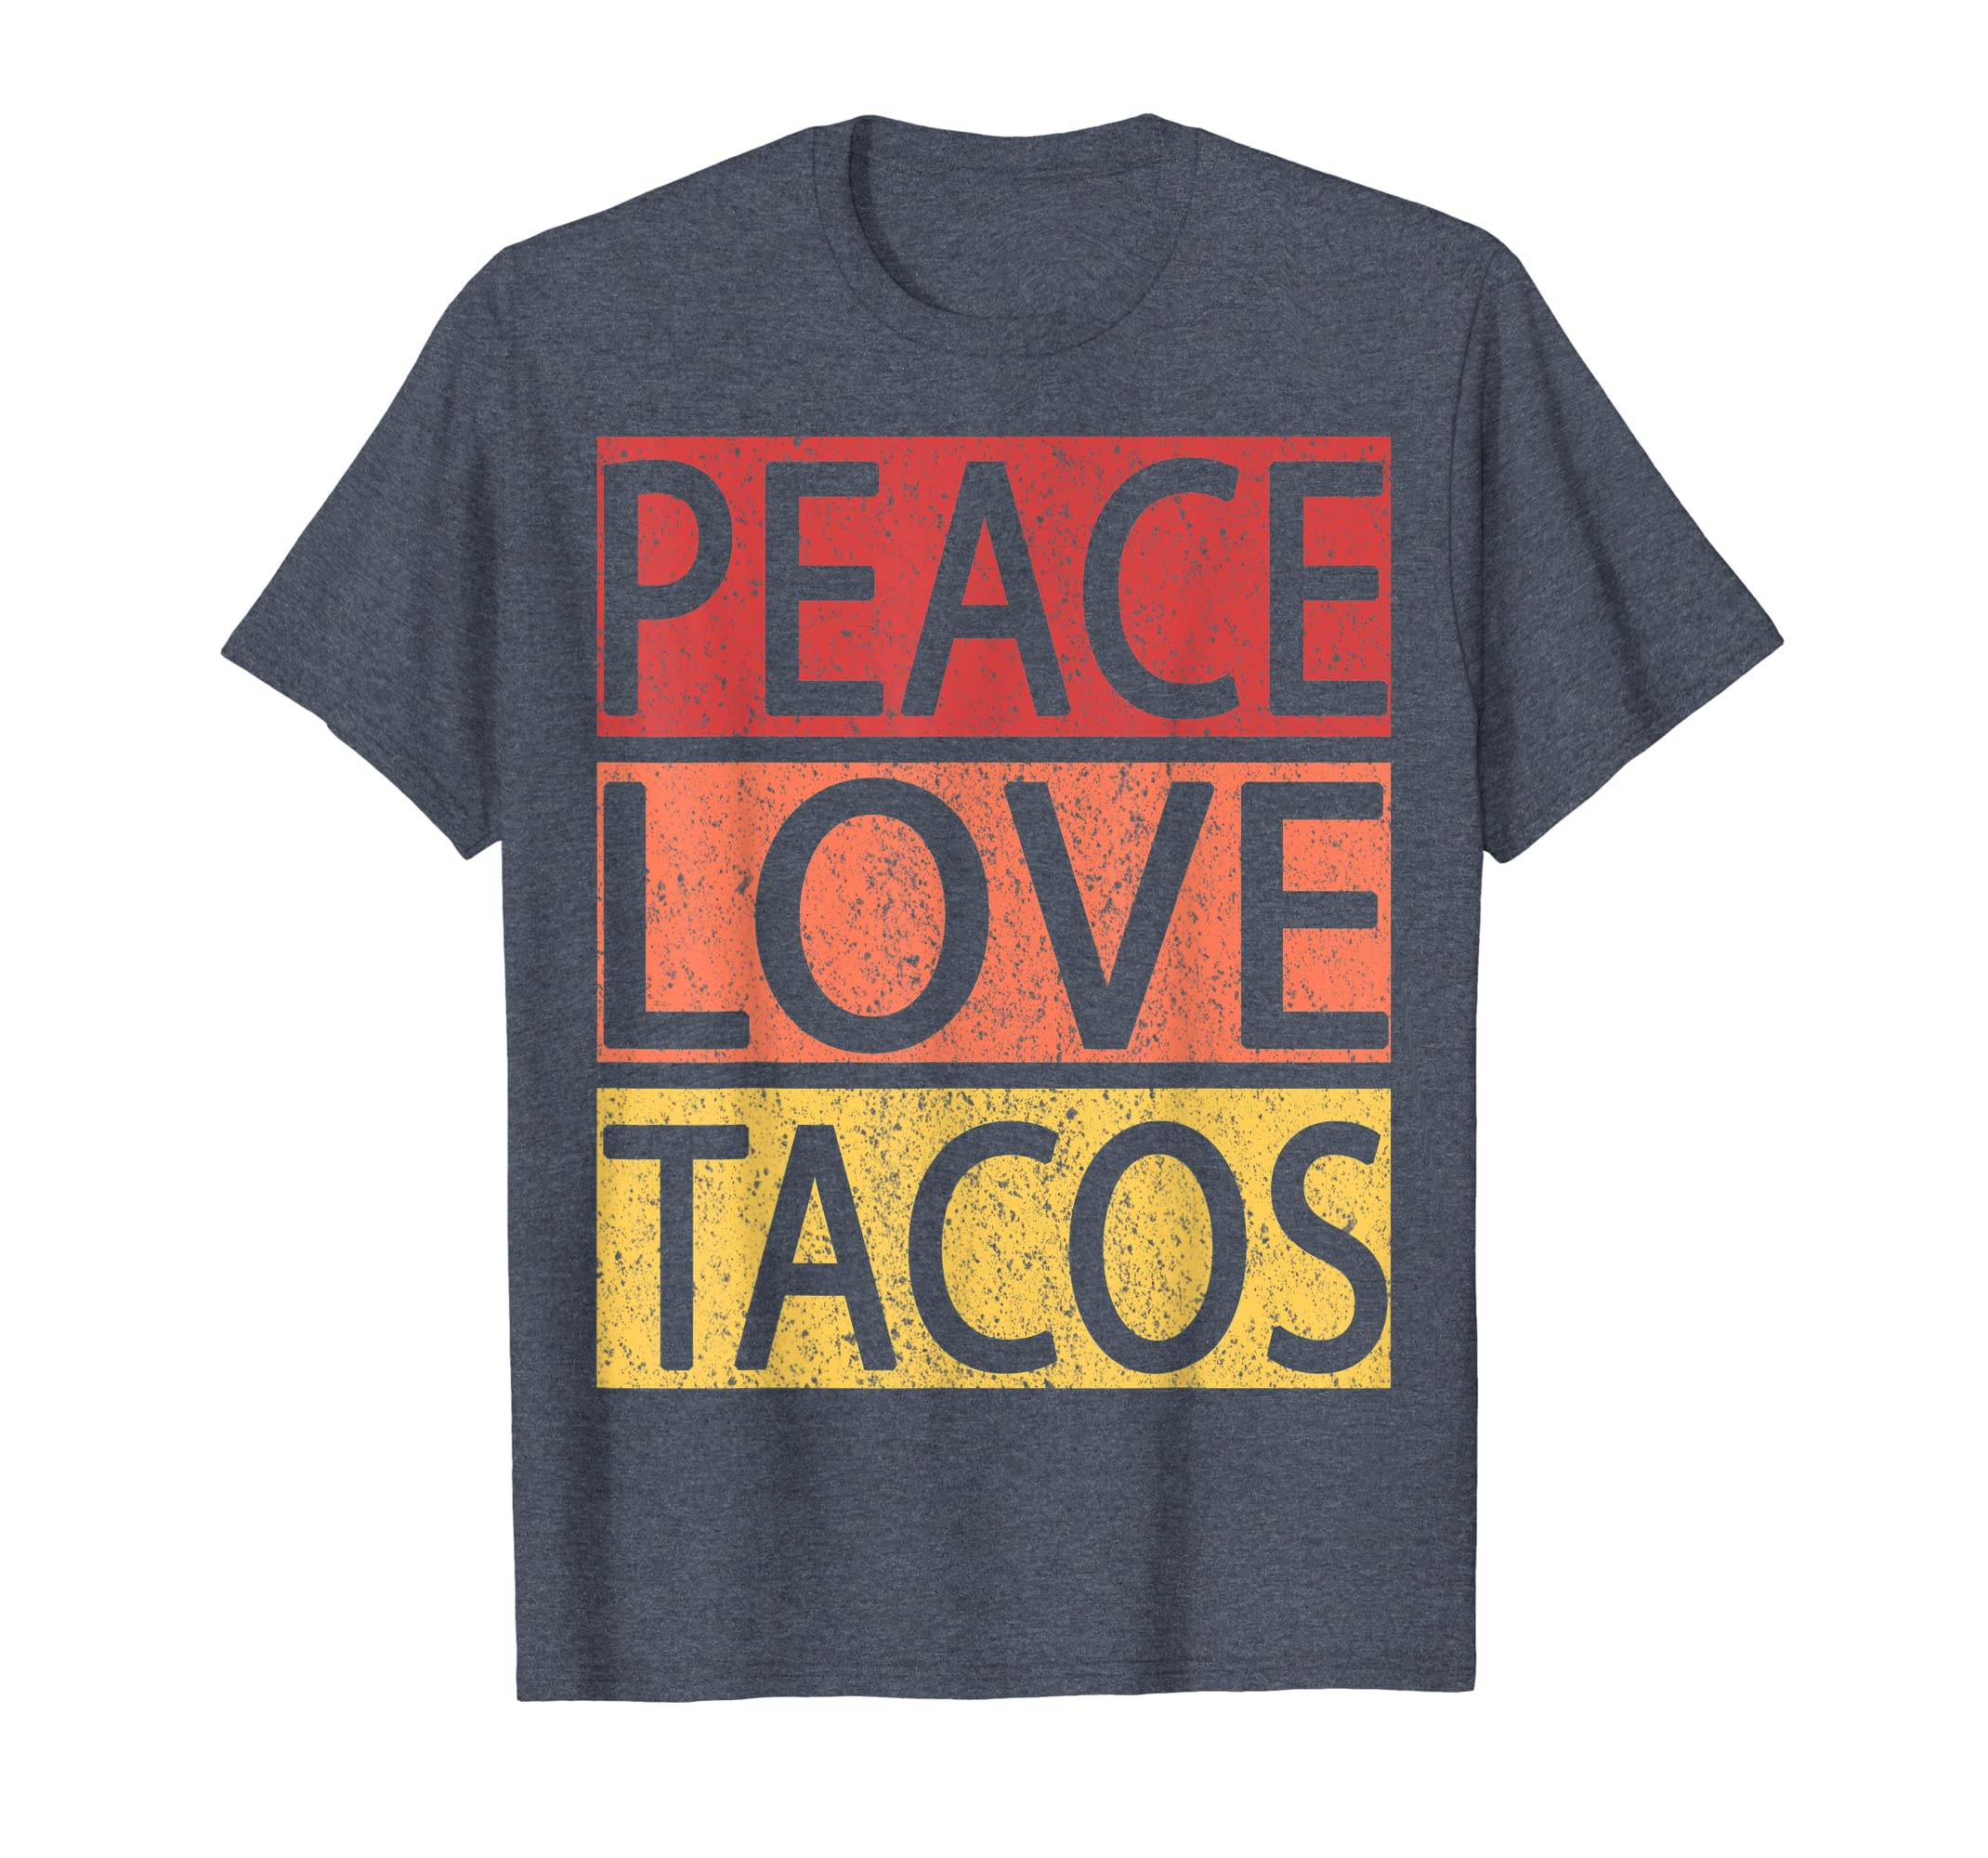 74e2dc00 Amazon.com: Vintage Peace Love Tacos Tshirt Cinco De Mayo Shirt Gift:  Clothing